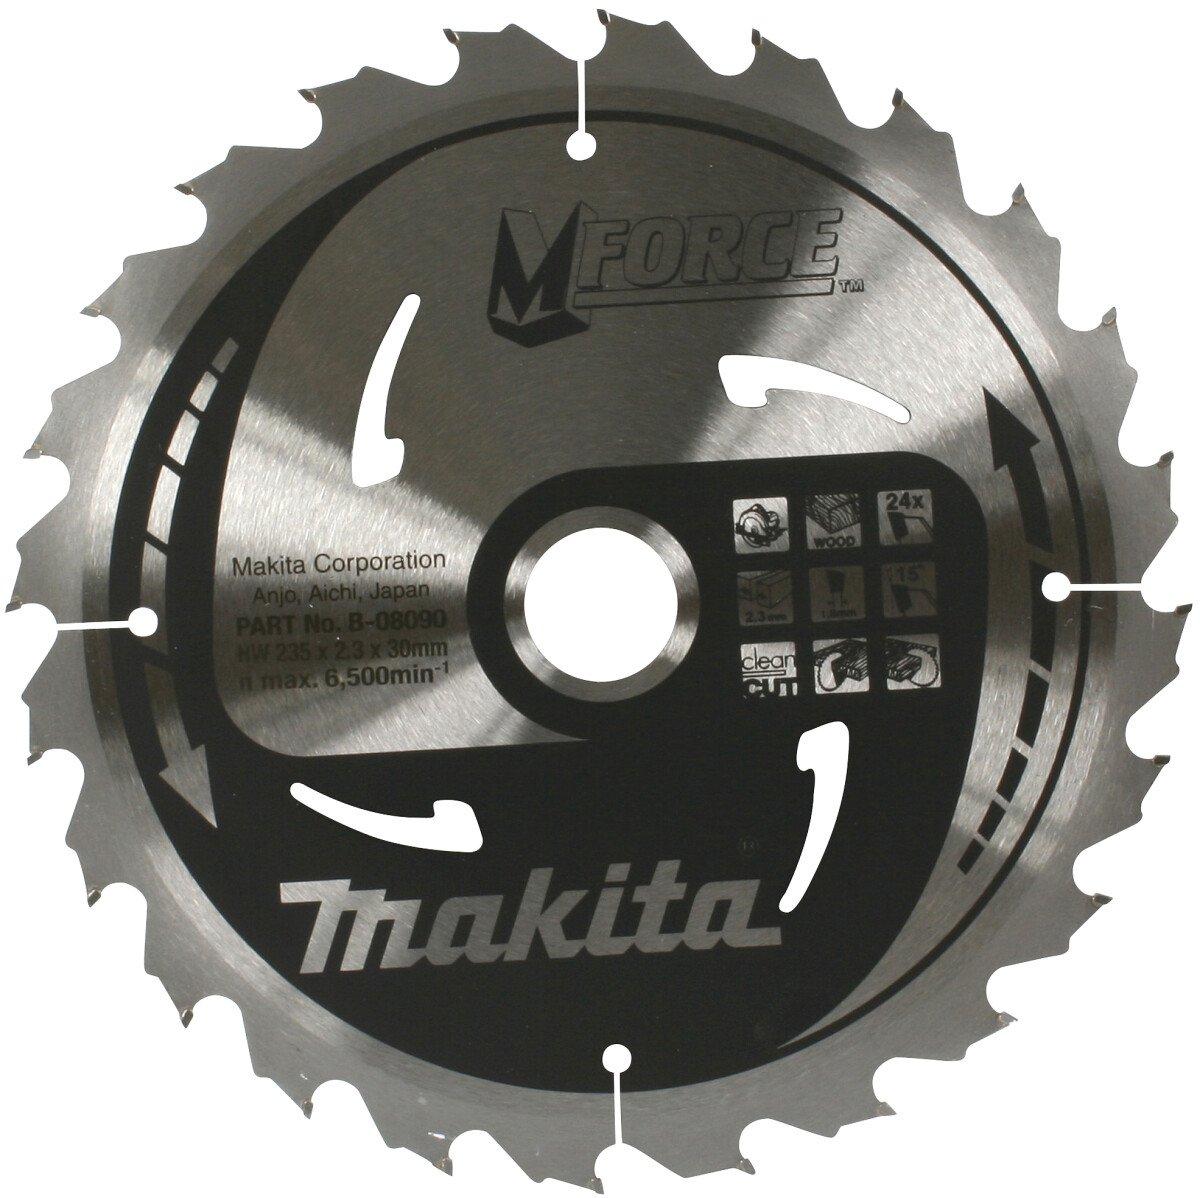 Makita B-07973 210x30mm 16T Circular Saw Blade B07973